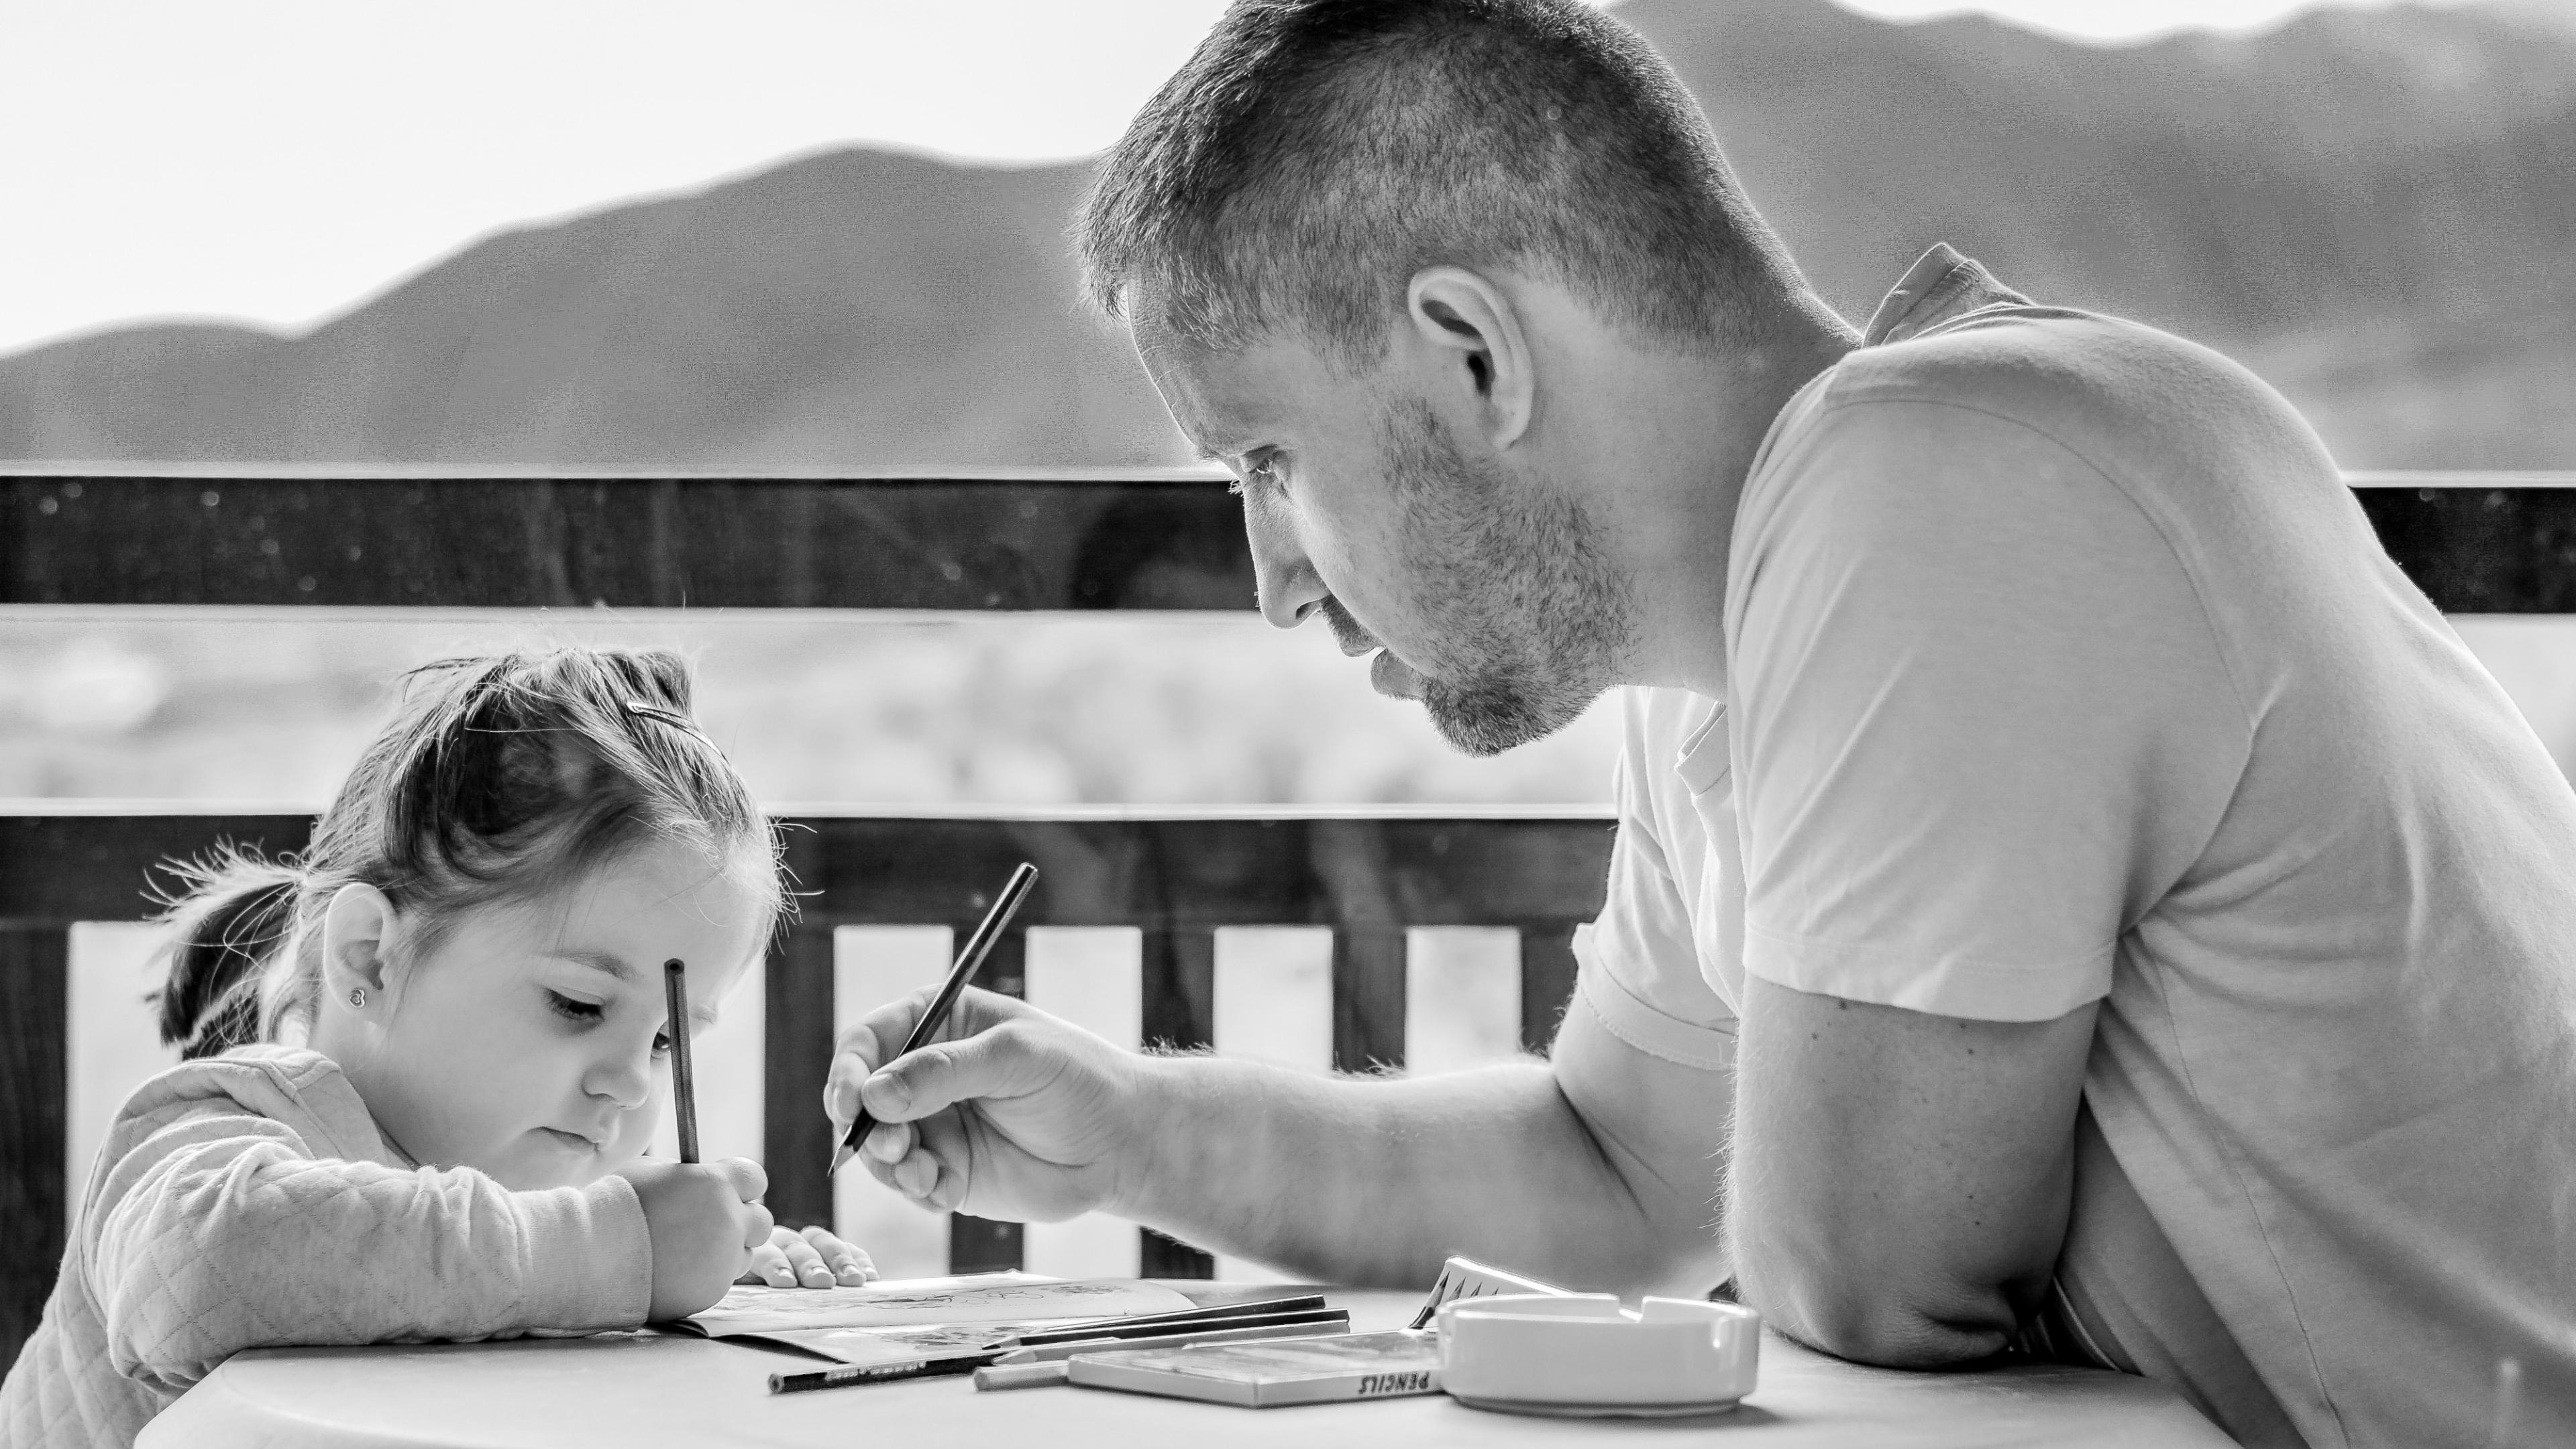 Равенство в семейных обязанностях снизило риск суицида